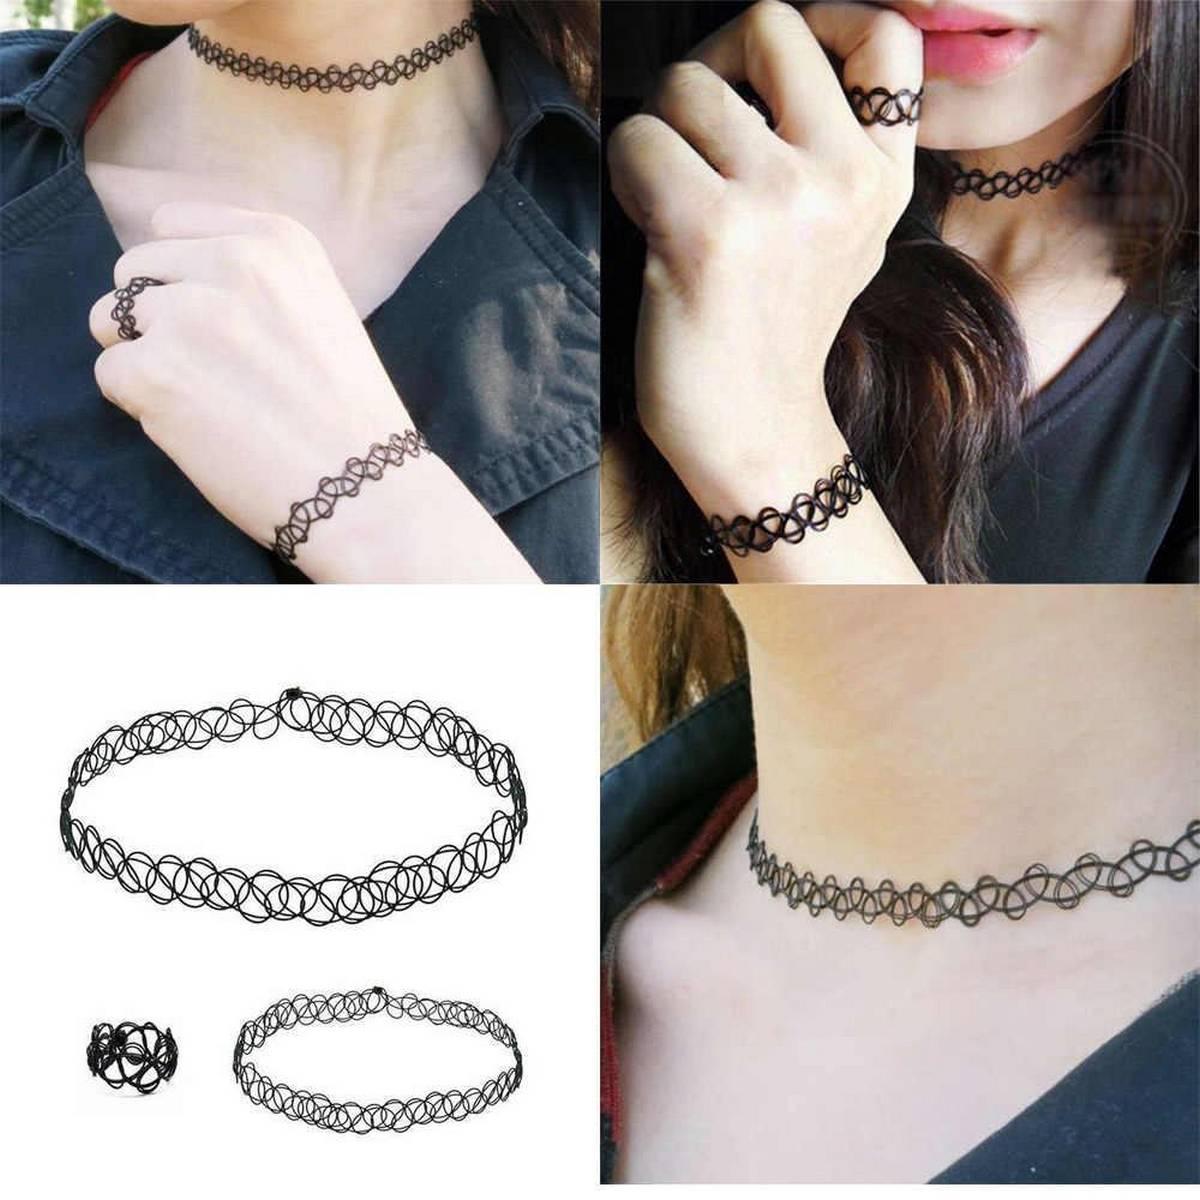 Retro Tattoo Choker Stretch Necklace/SET Black Elastic Jewelry Charms Bracelet & Necklace